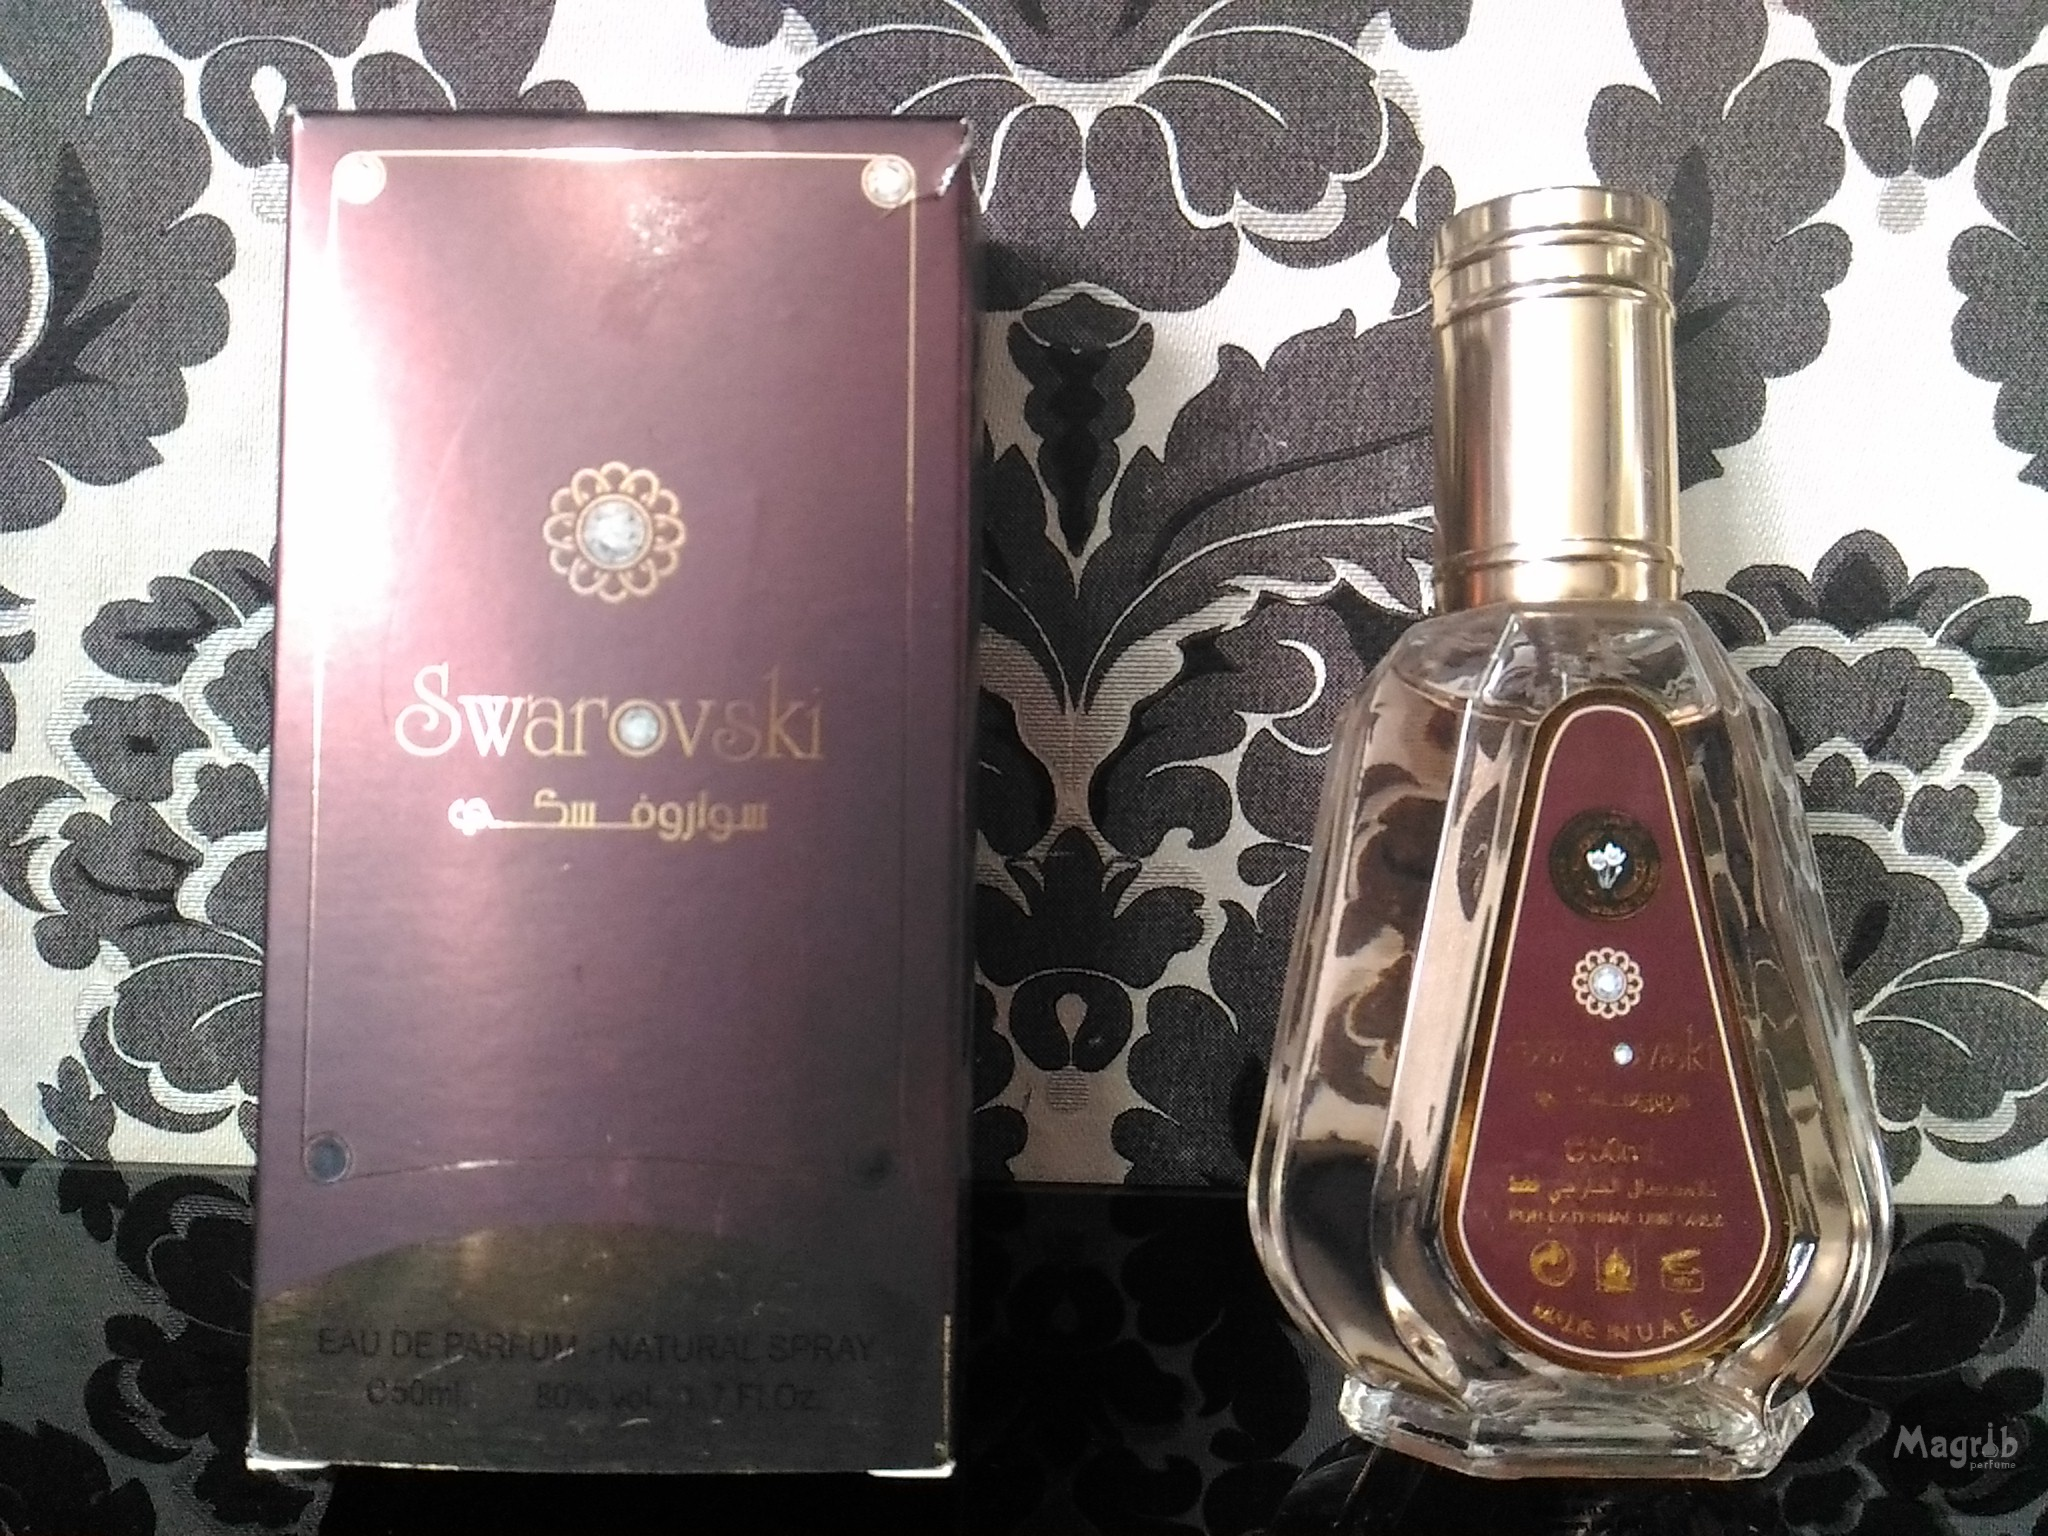 Ard al Zaafaran Swarovski 50ml - унисекс, парфюмерная вода